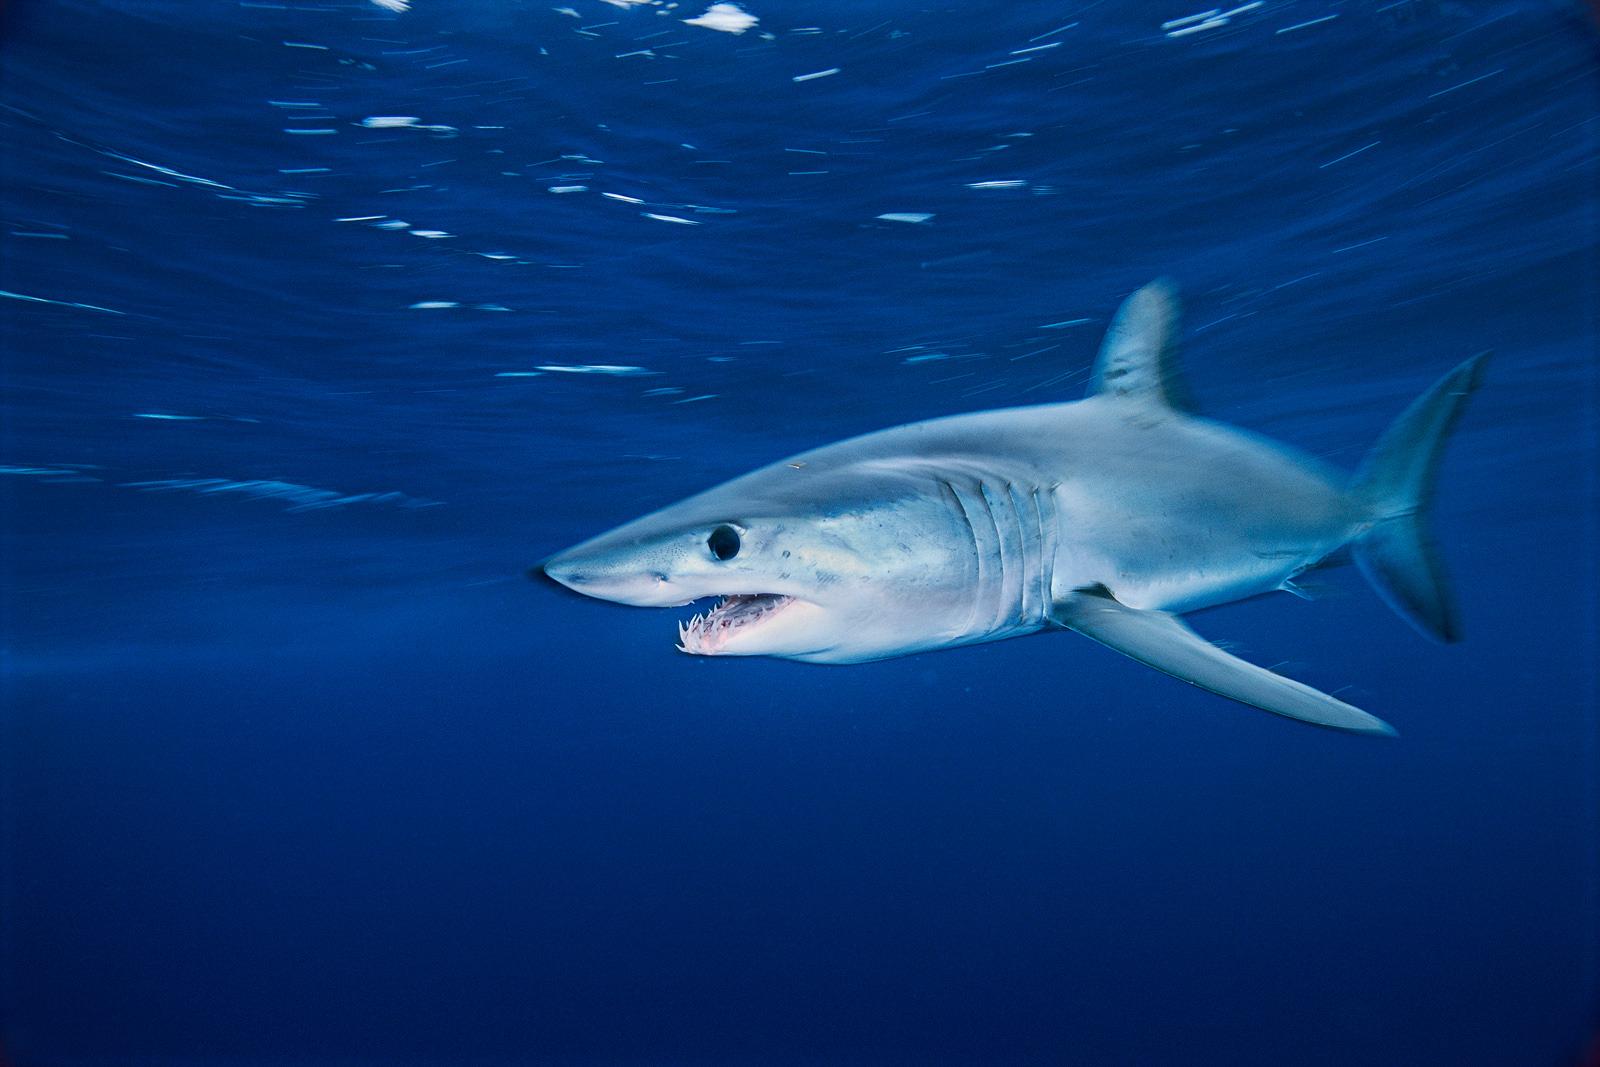 Mako shark underwater wallpaper